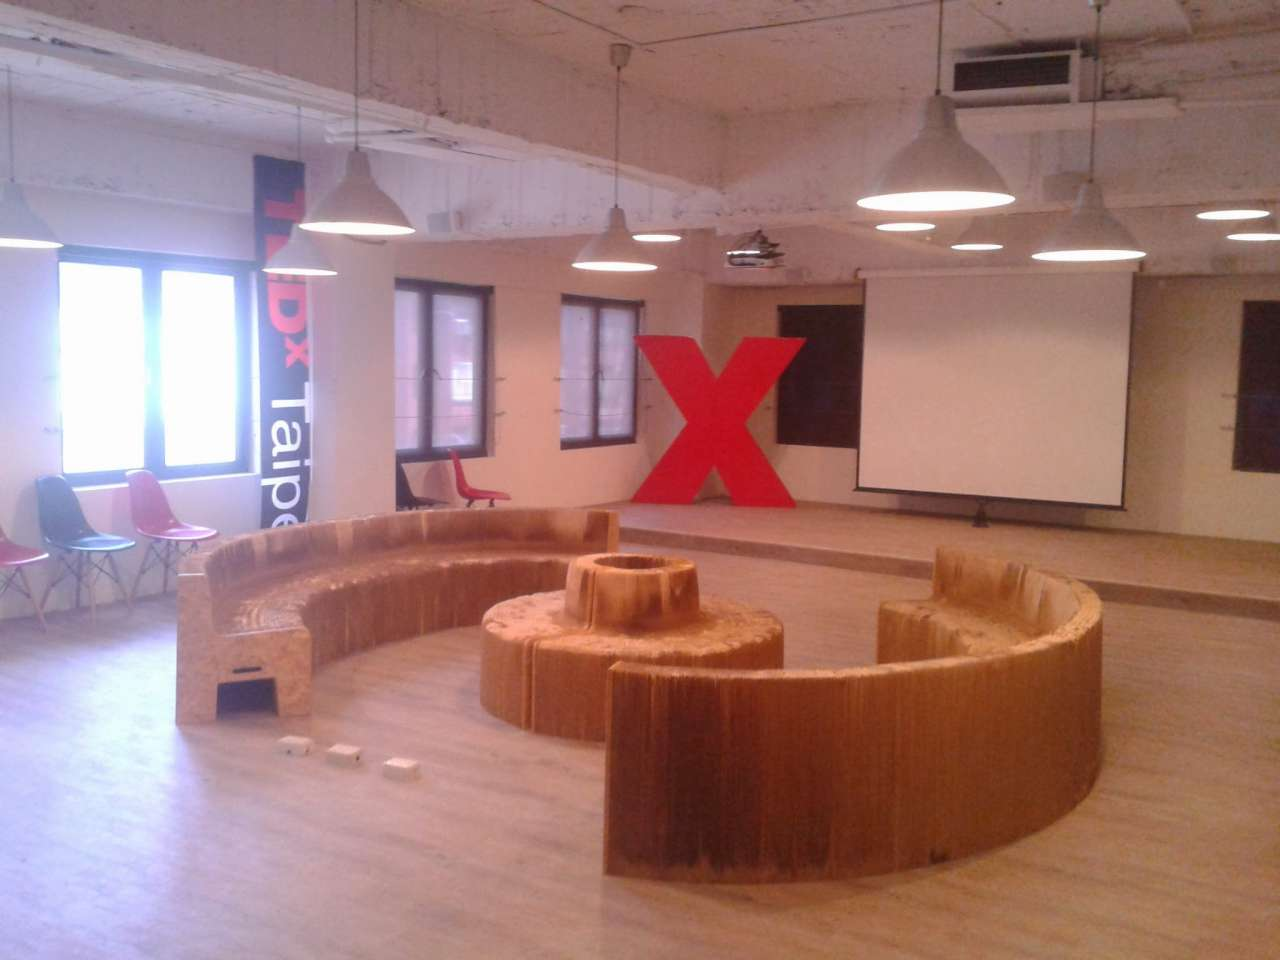 TEDxTaipei 空間-下一代文藝復興的基地